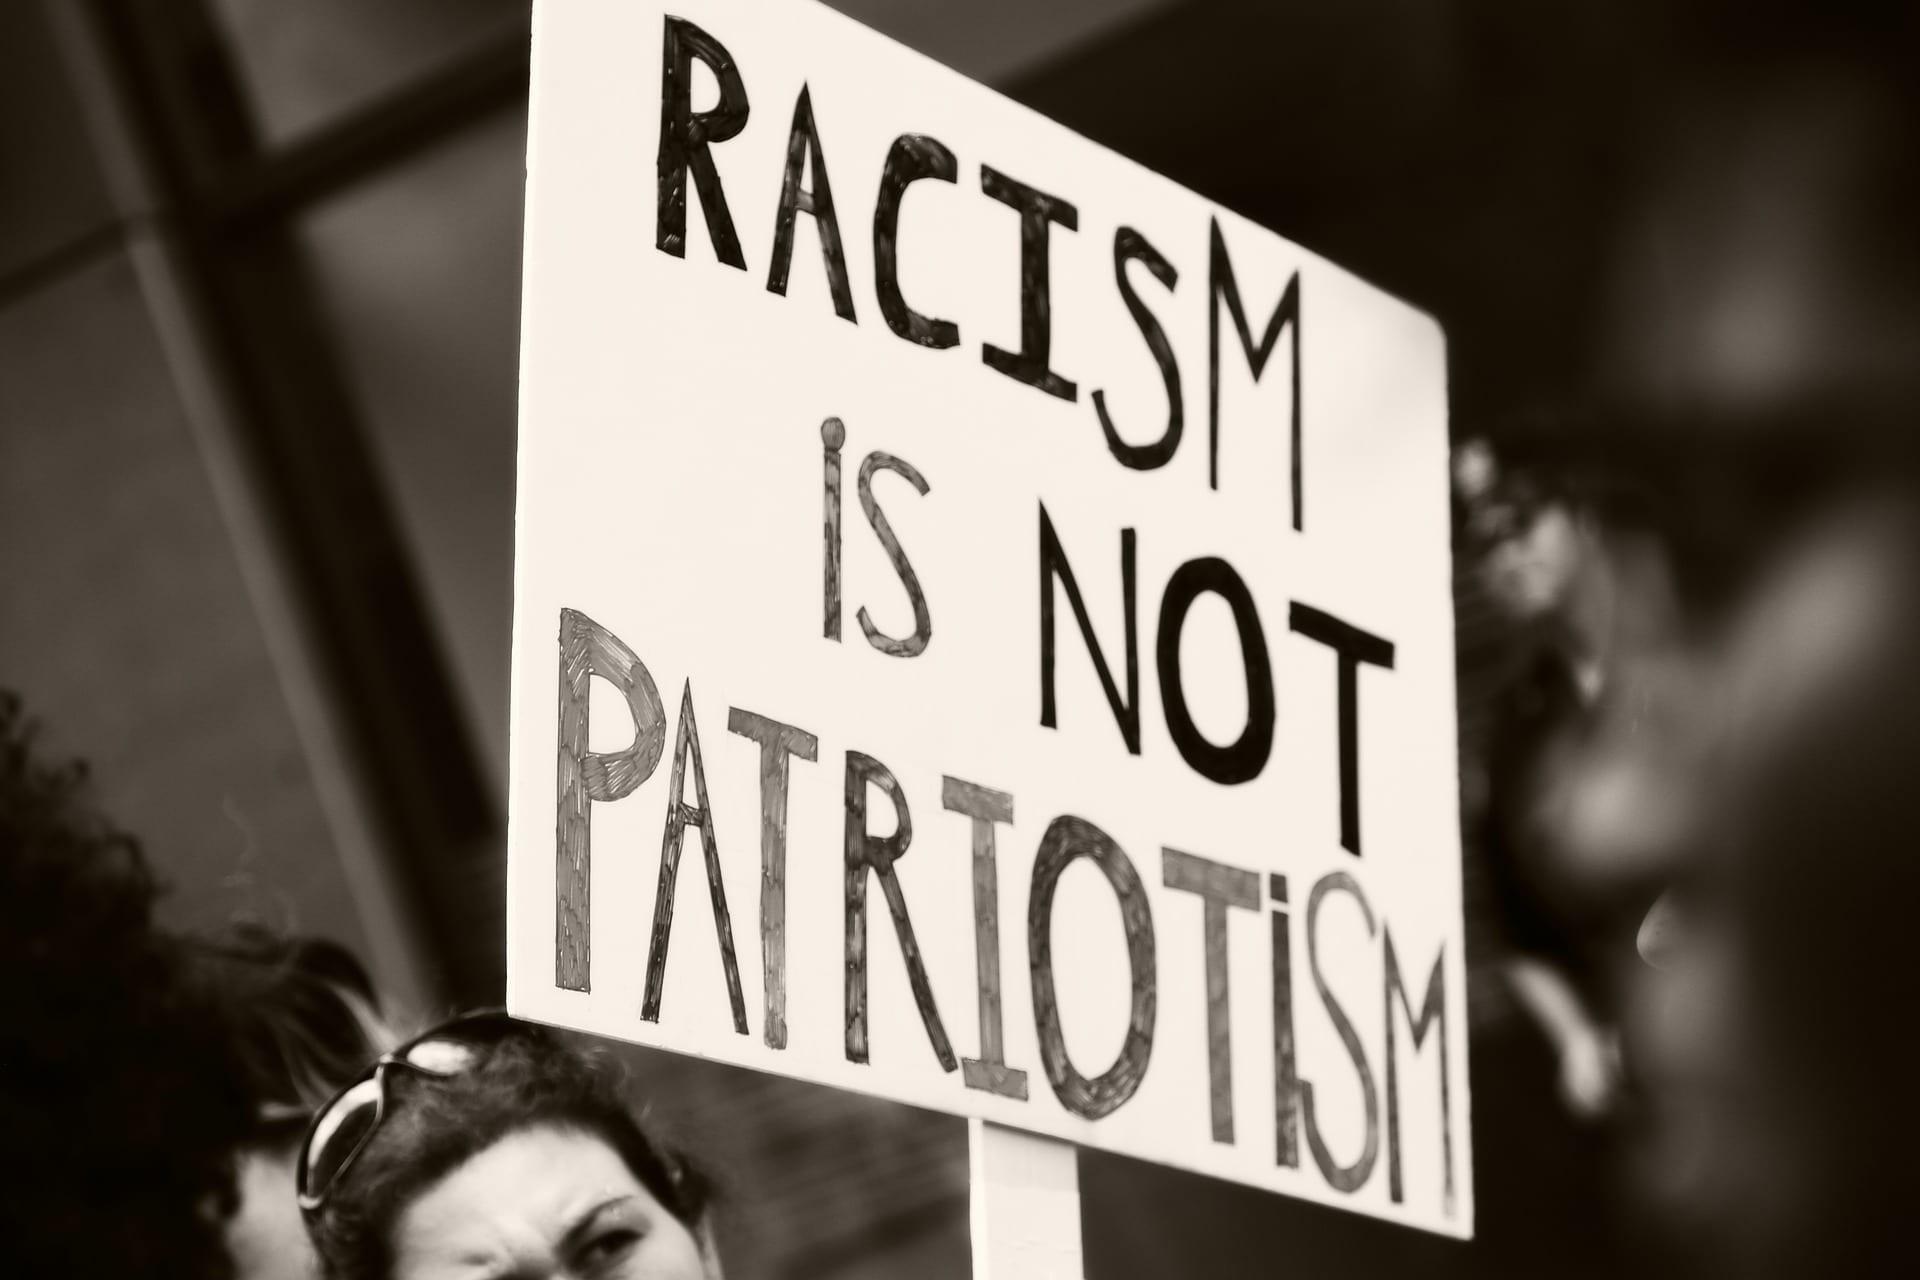 Tu non sei razzista, sei stronzo